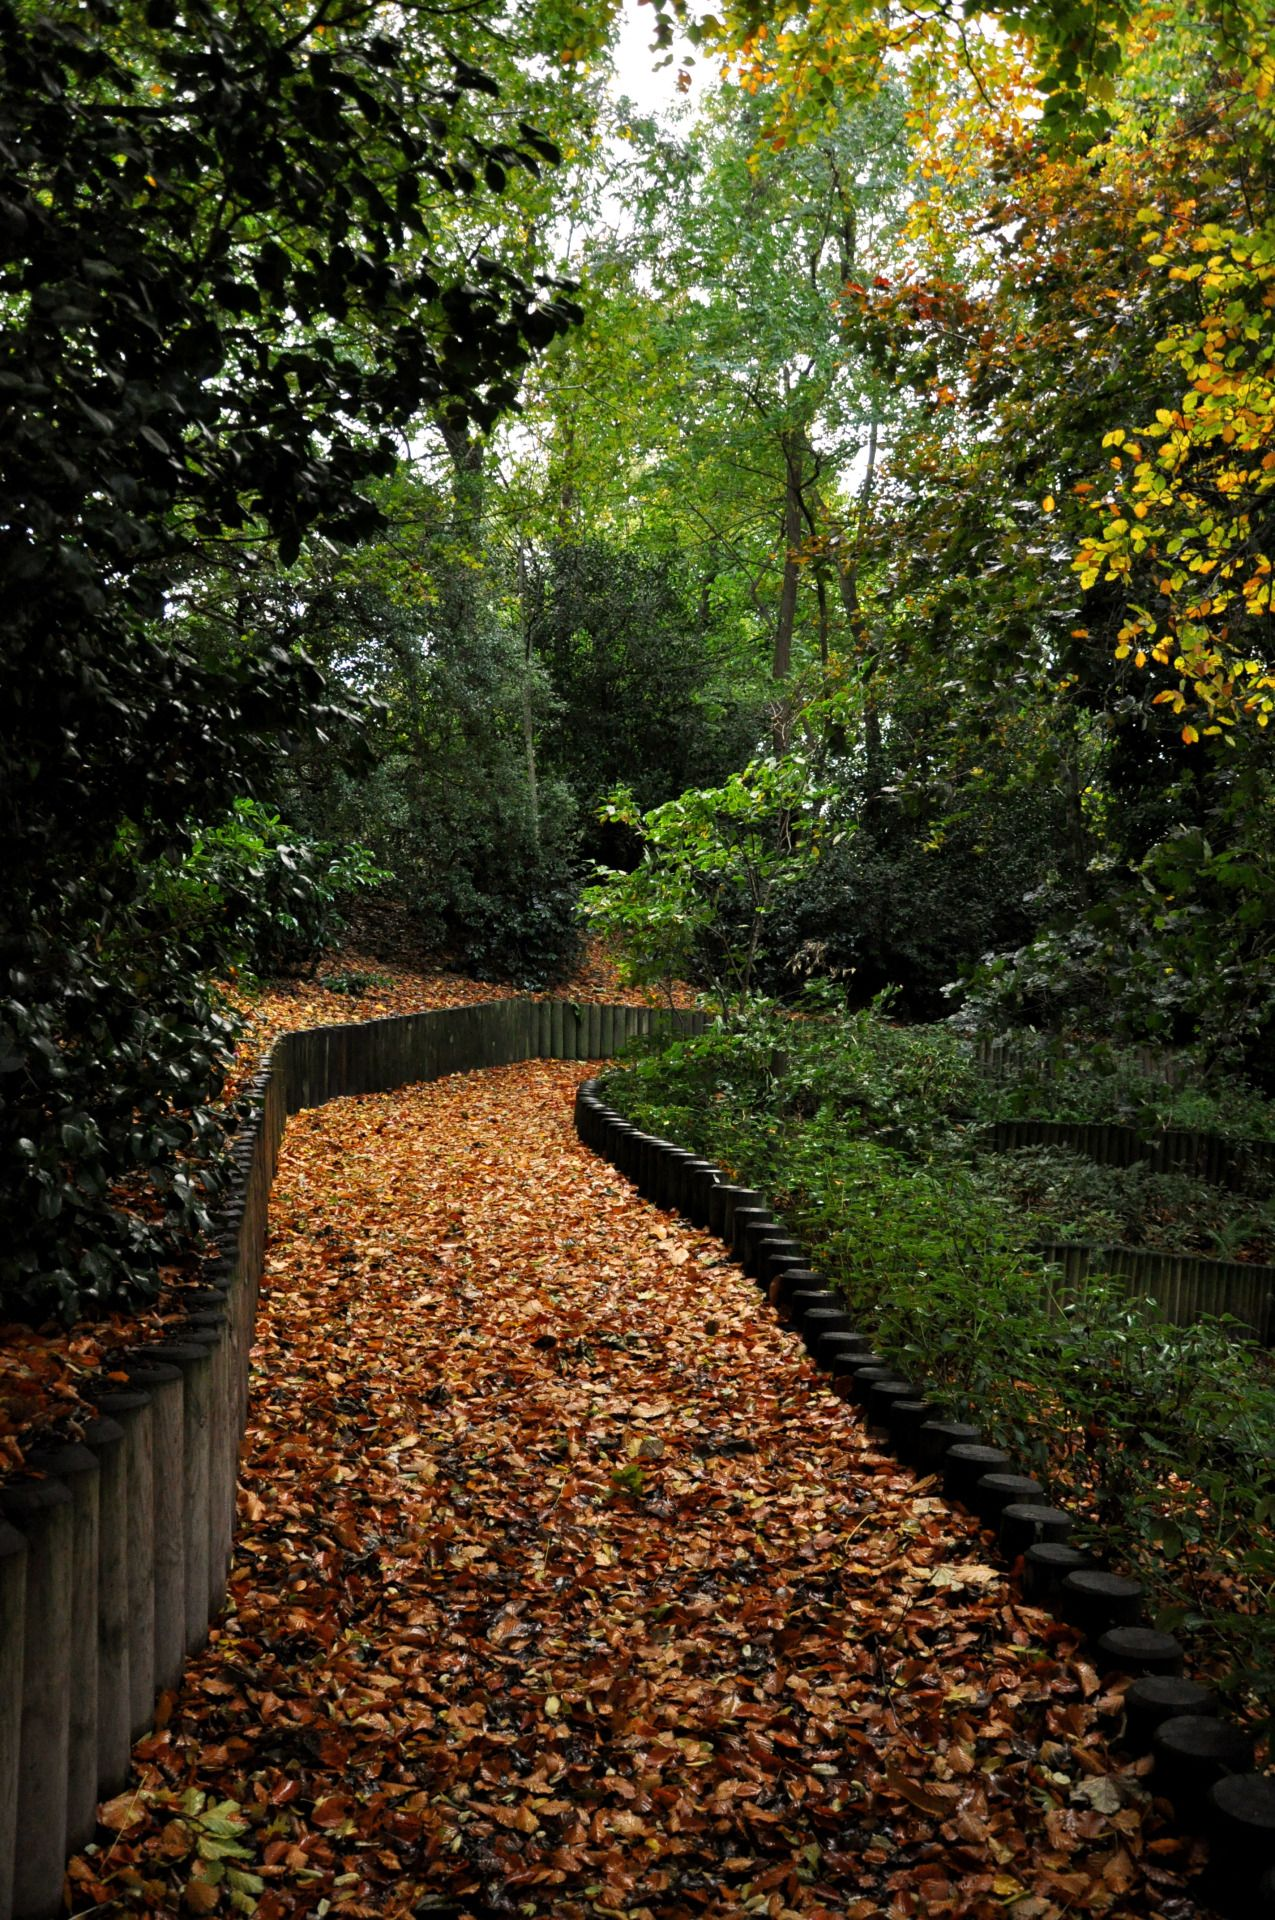 ineedtoconvey:  Autumn is beautiful.